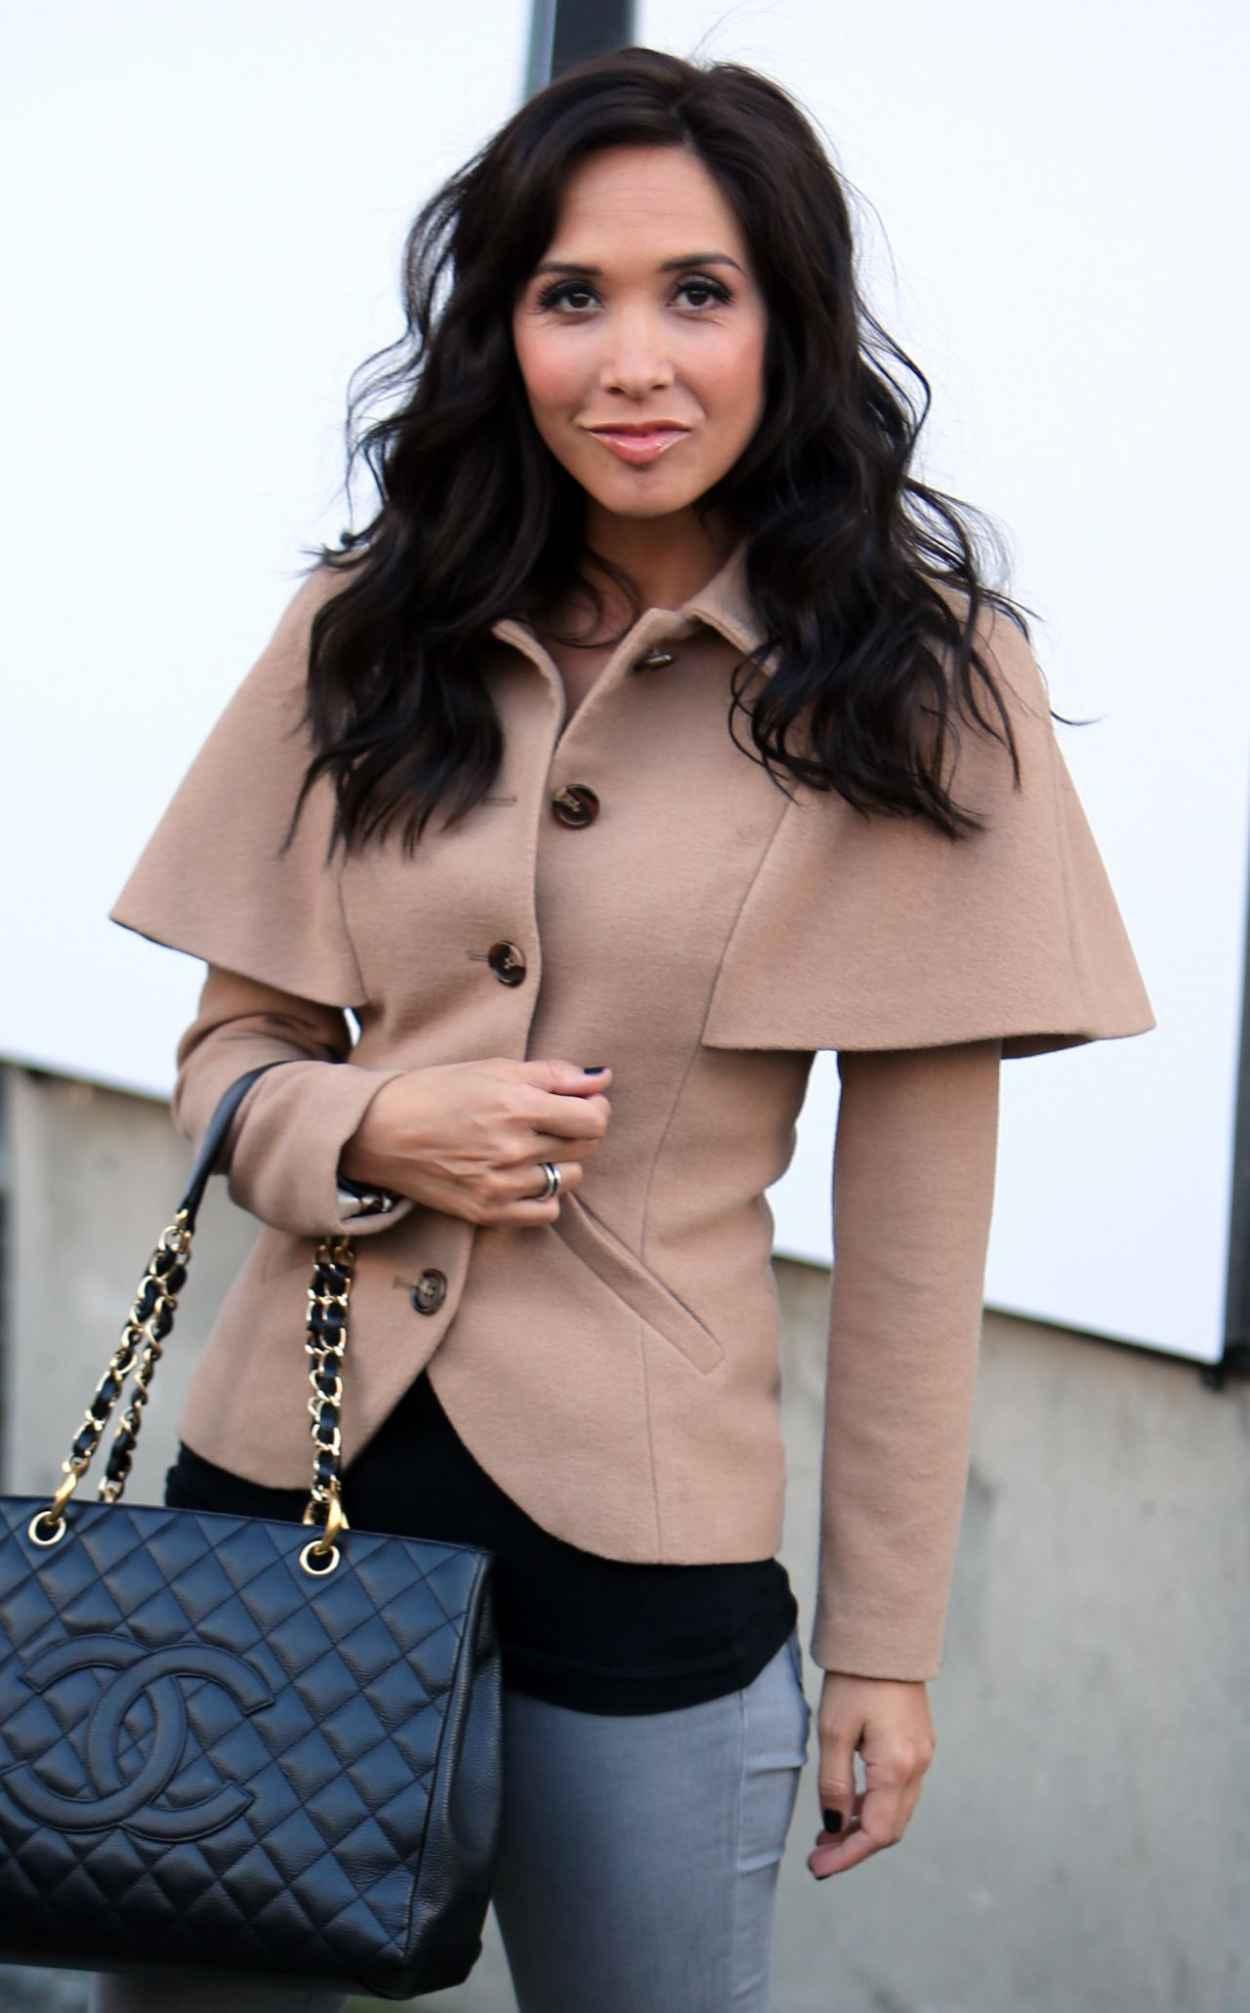 Myleene Klass Street Style - in Jeans and FMBs - London, January 2015-1